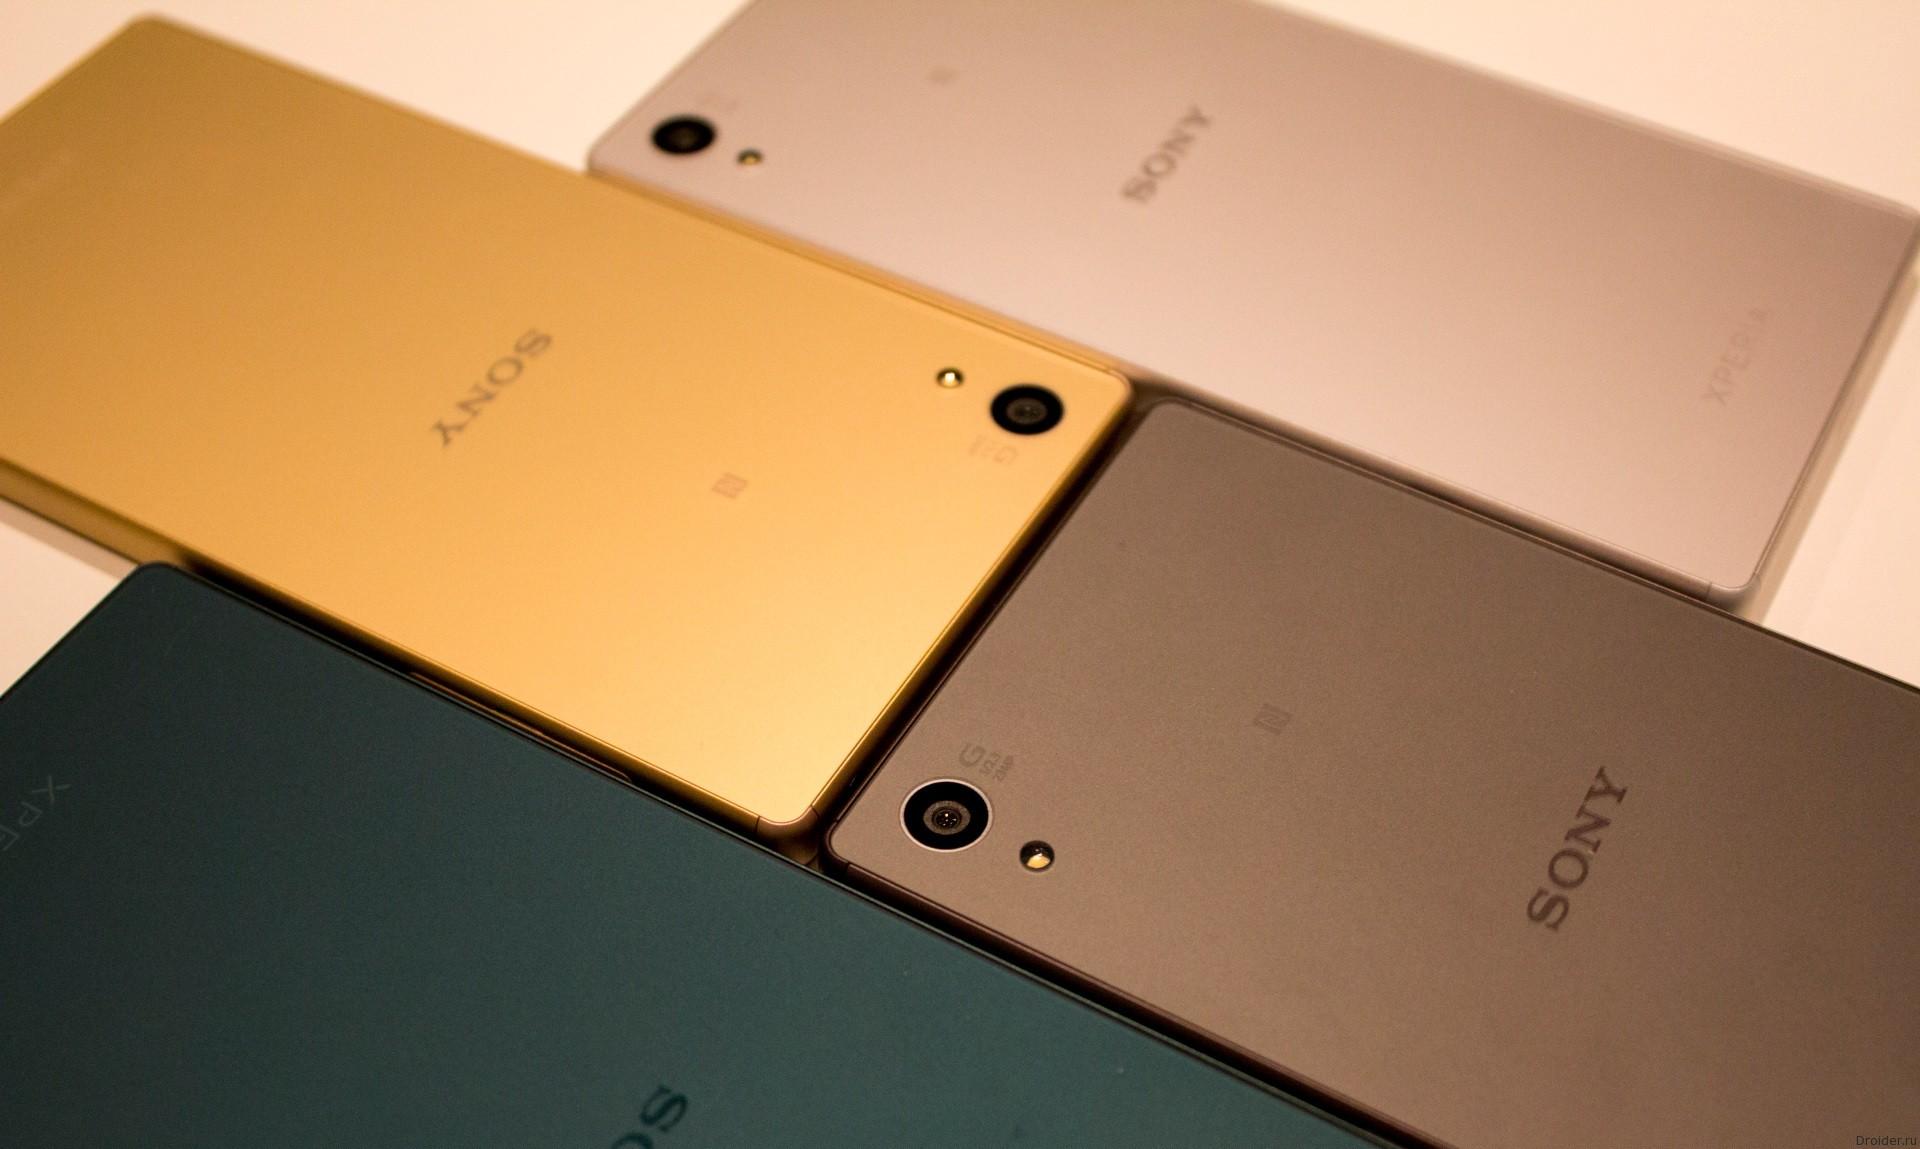 Первые подробности про Xperia Z6 Lite от Sony